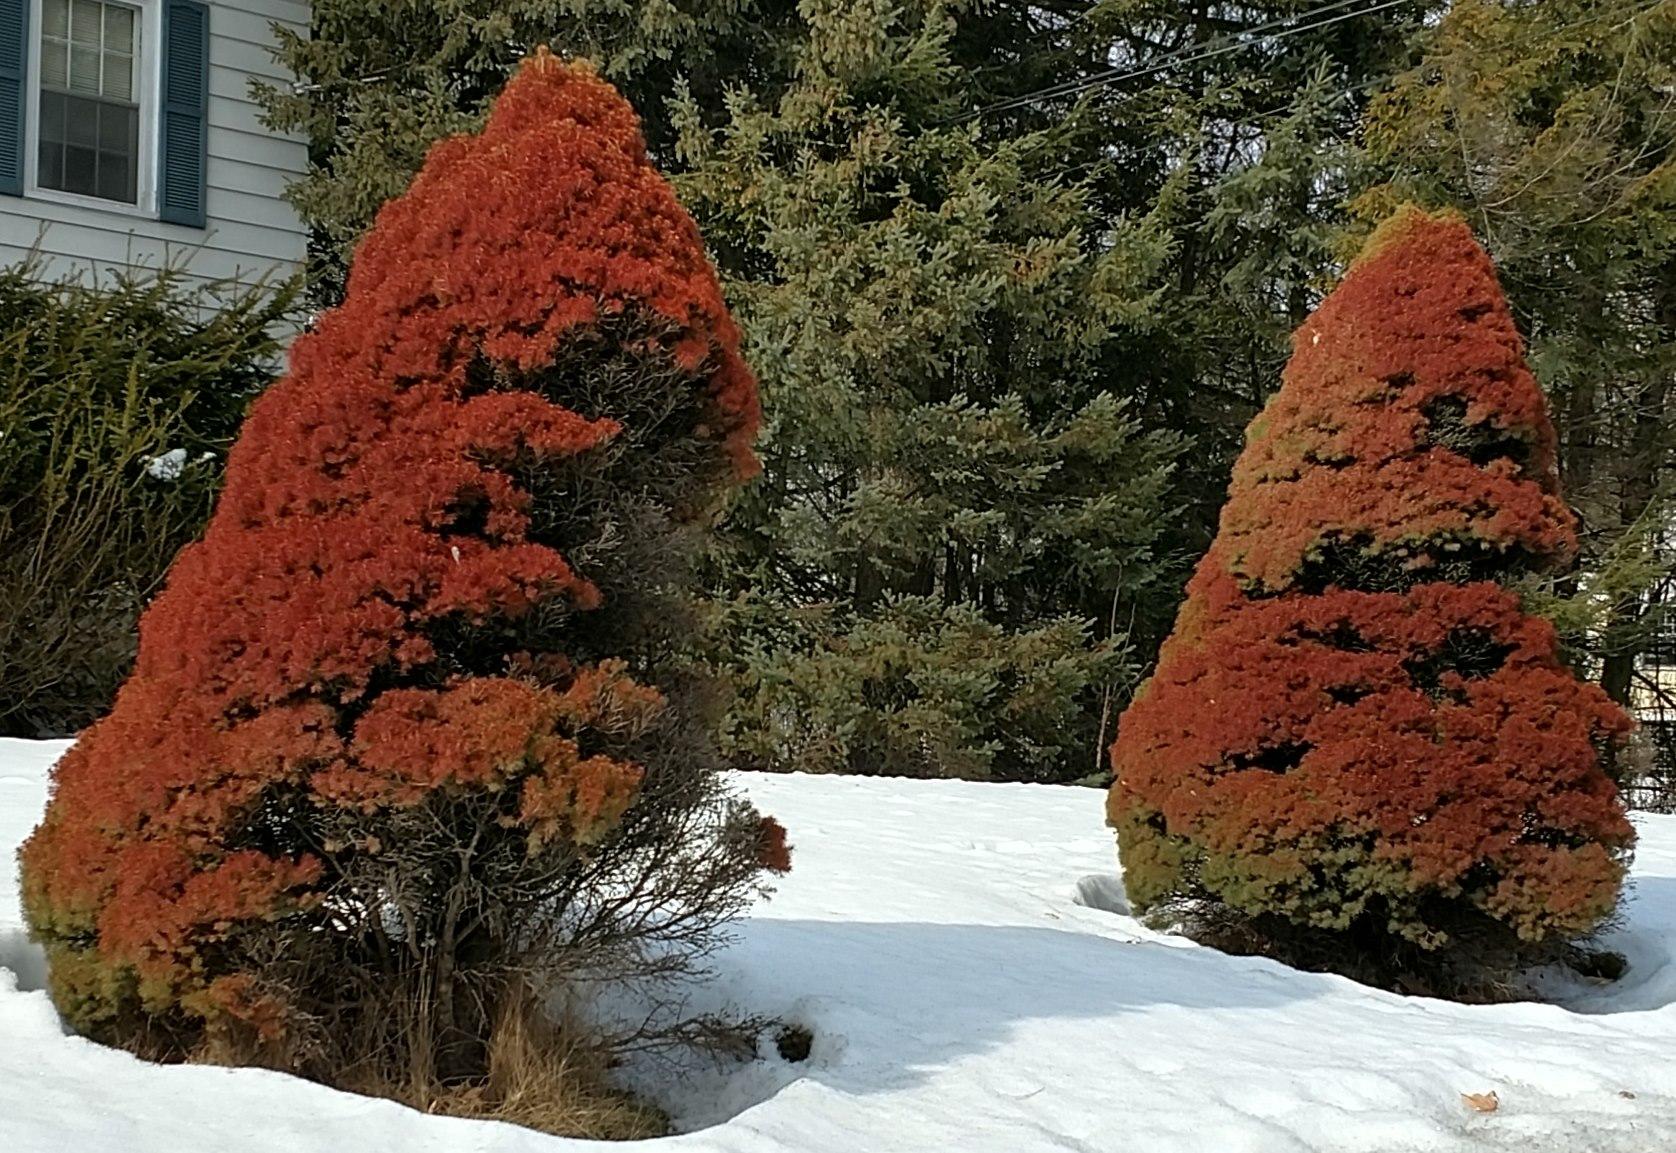 sun scald alberta - Garden Goddess Sense and Sustainability: A ...